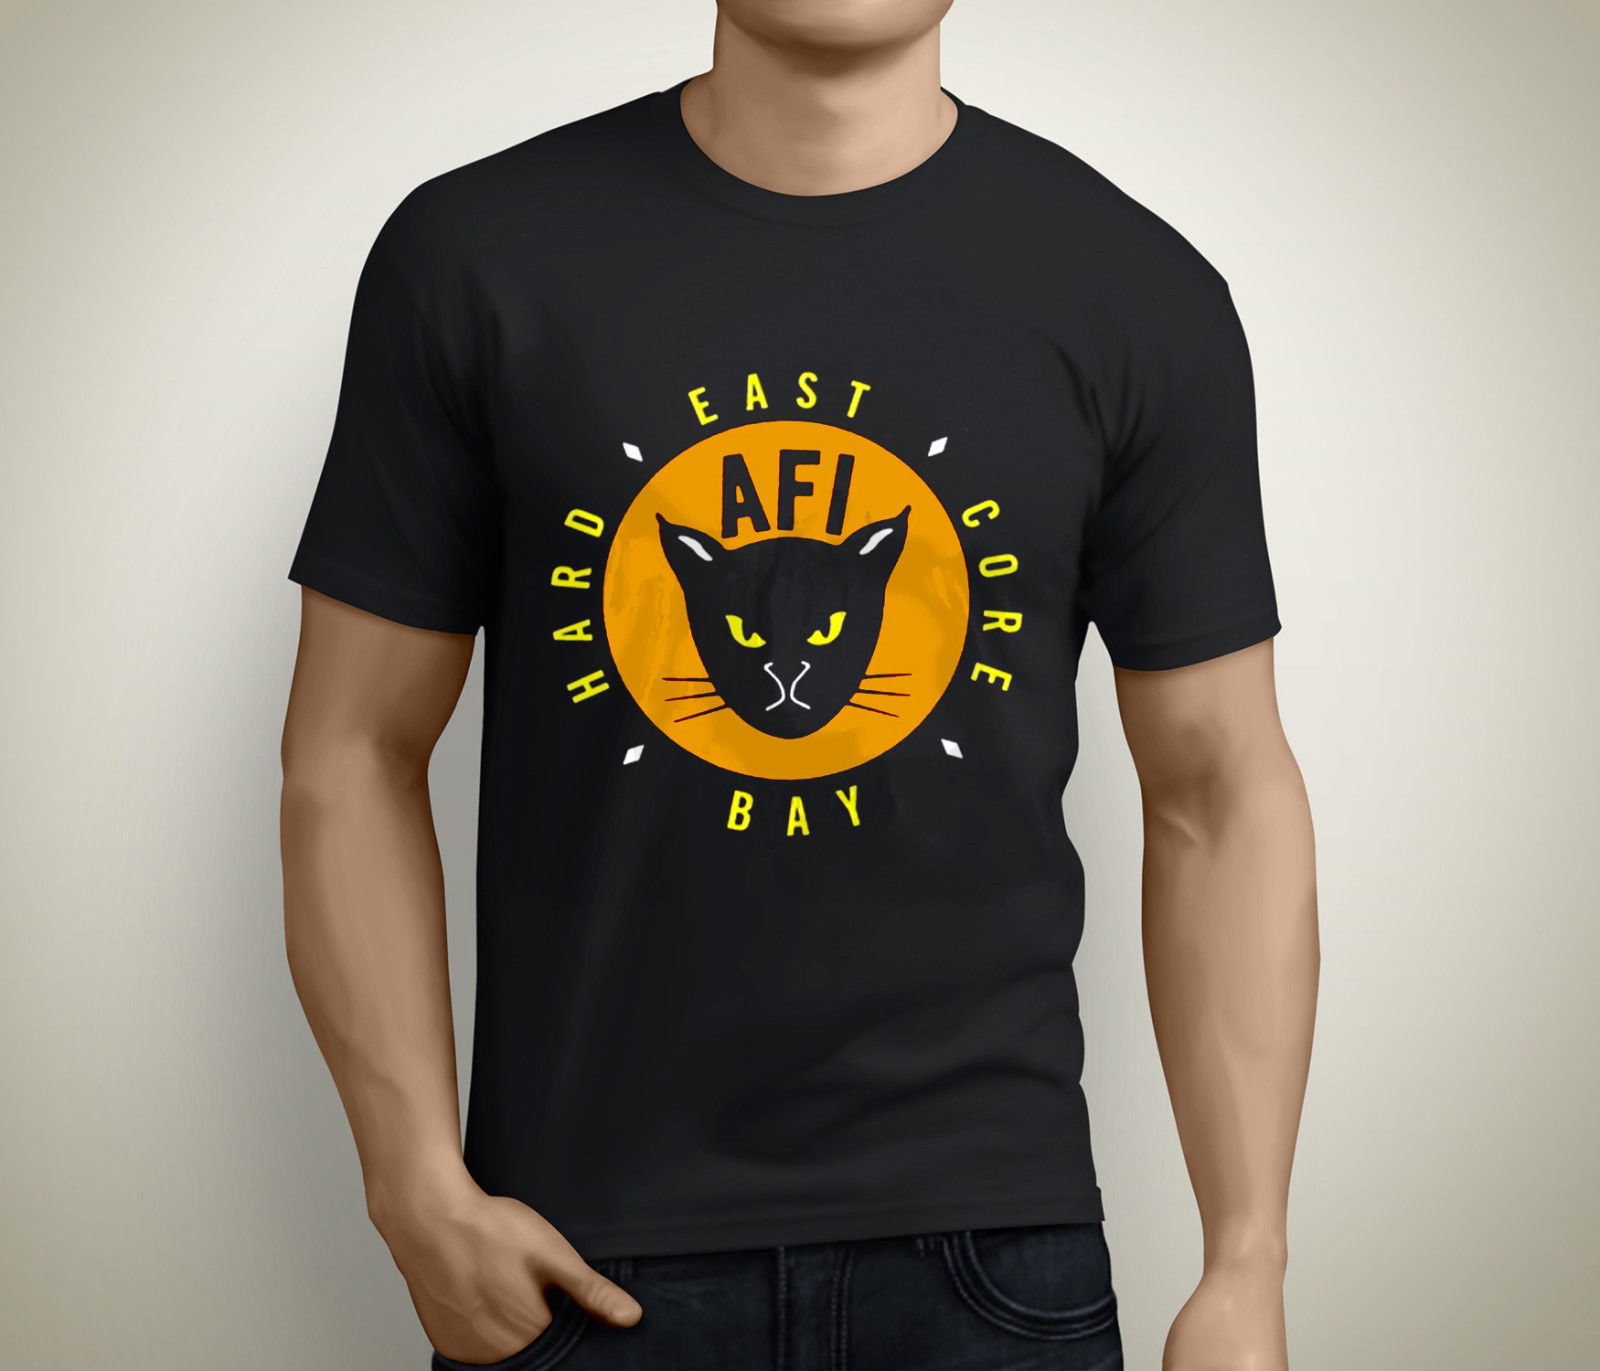 Новый afi East Bay Kitty рок-группа короткий рукав Для мужчин черный футболка Размеры S до 5xl